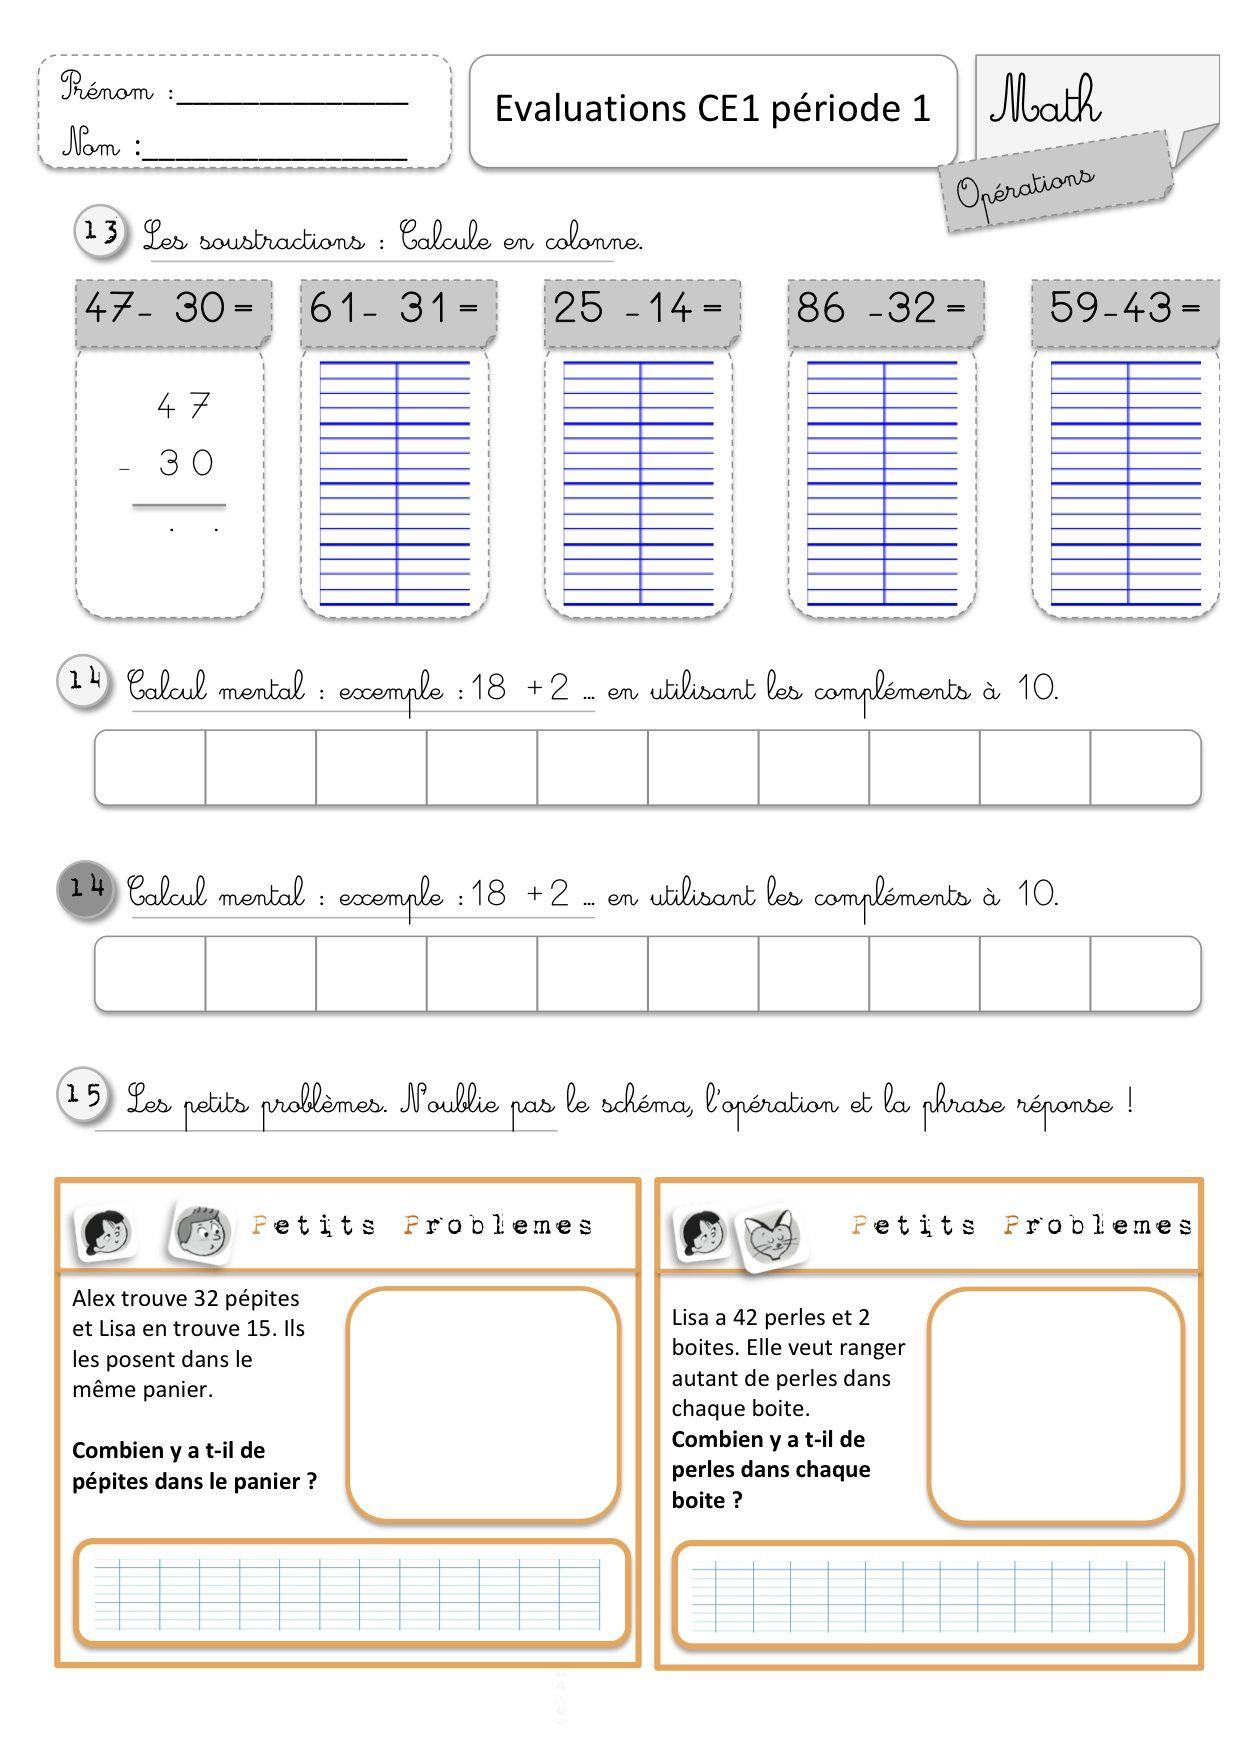 Evaluations ce1 1er semestre education cole evaluation ce1 evaluation math ce1 et ce1 - Evaluation multiplication ce2 a imprimer ...